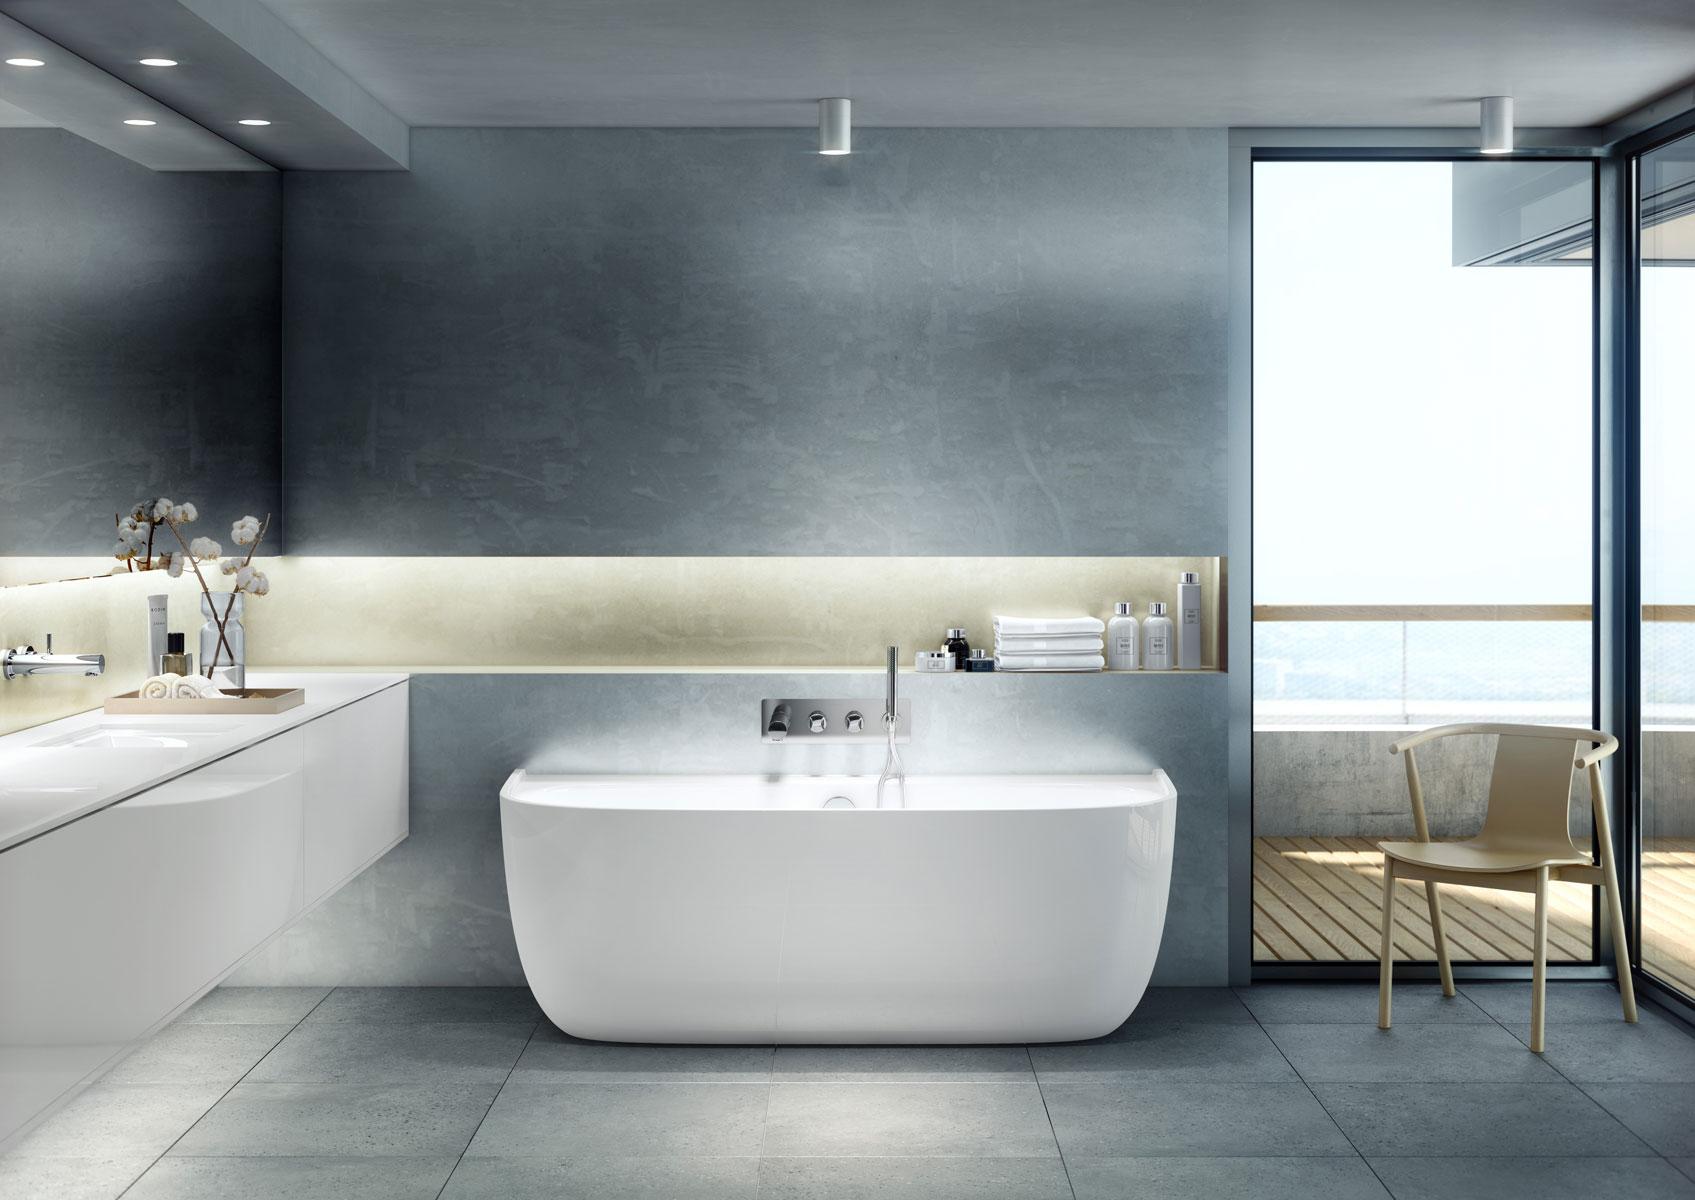 Rivestimento Vasca Da Bagno Roma : Eldon la vasca da bagno elegante e contemporanea